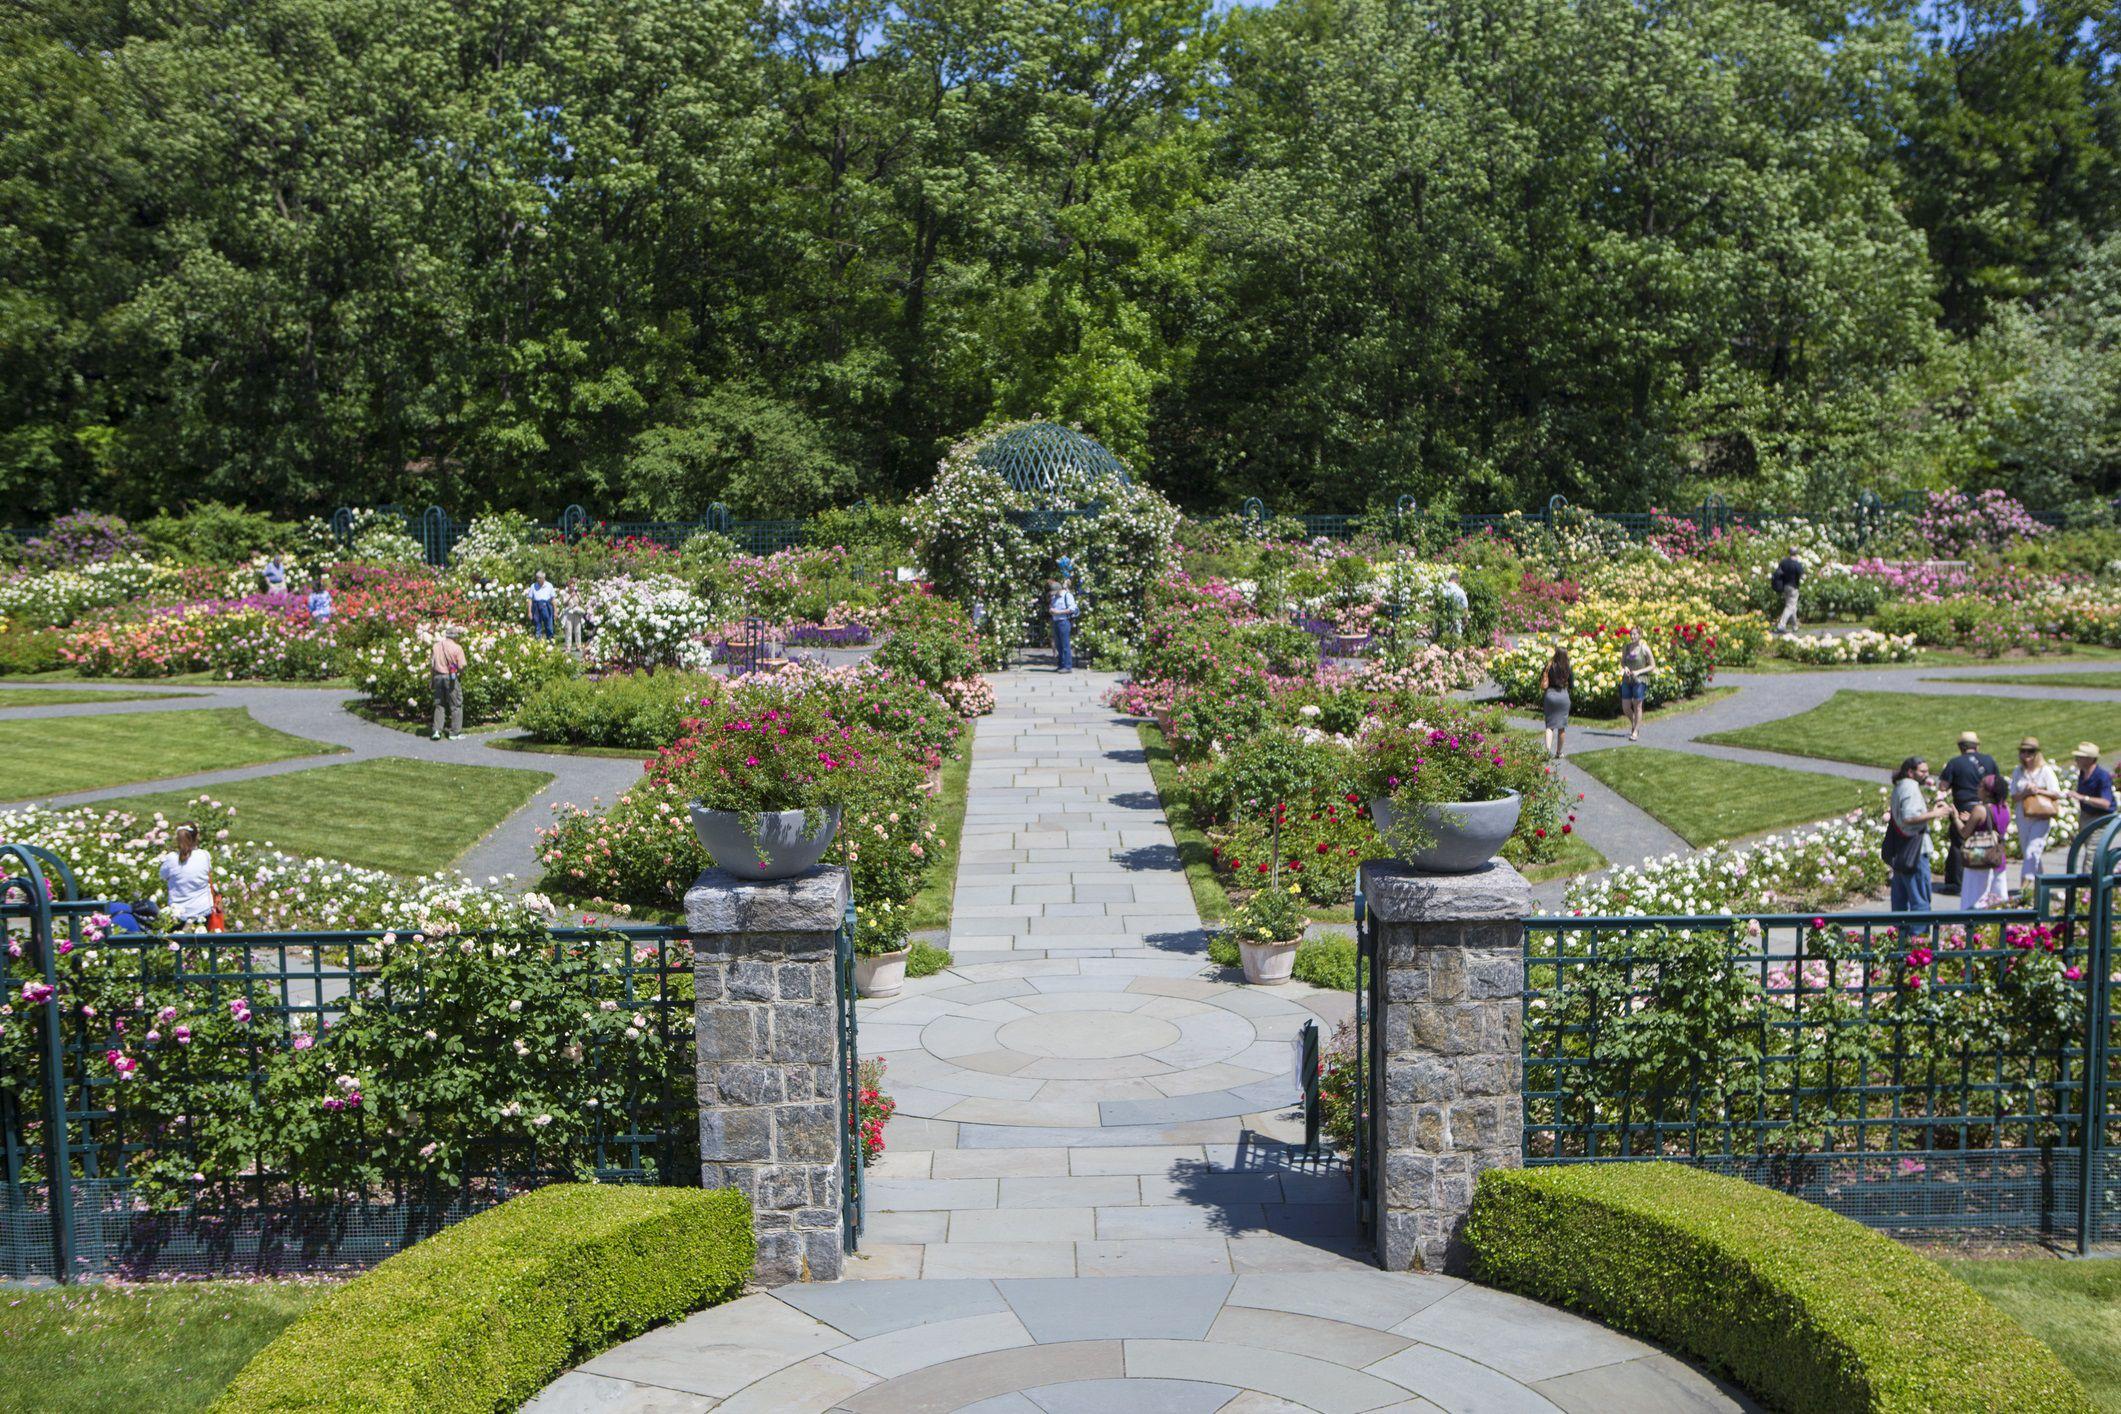 Rose Garden at The New York Botanical Garden